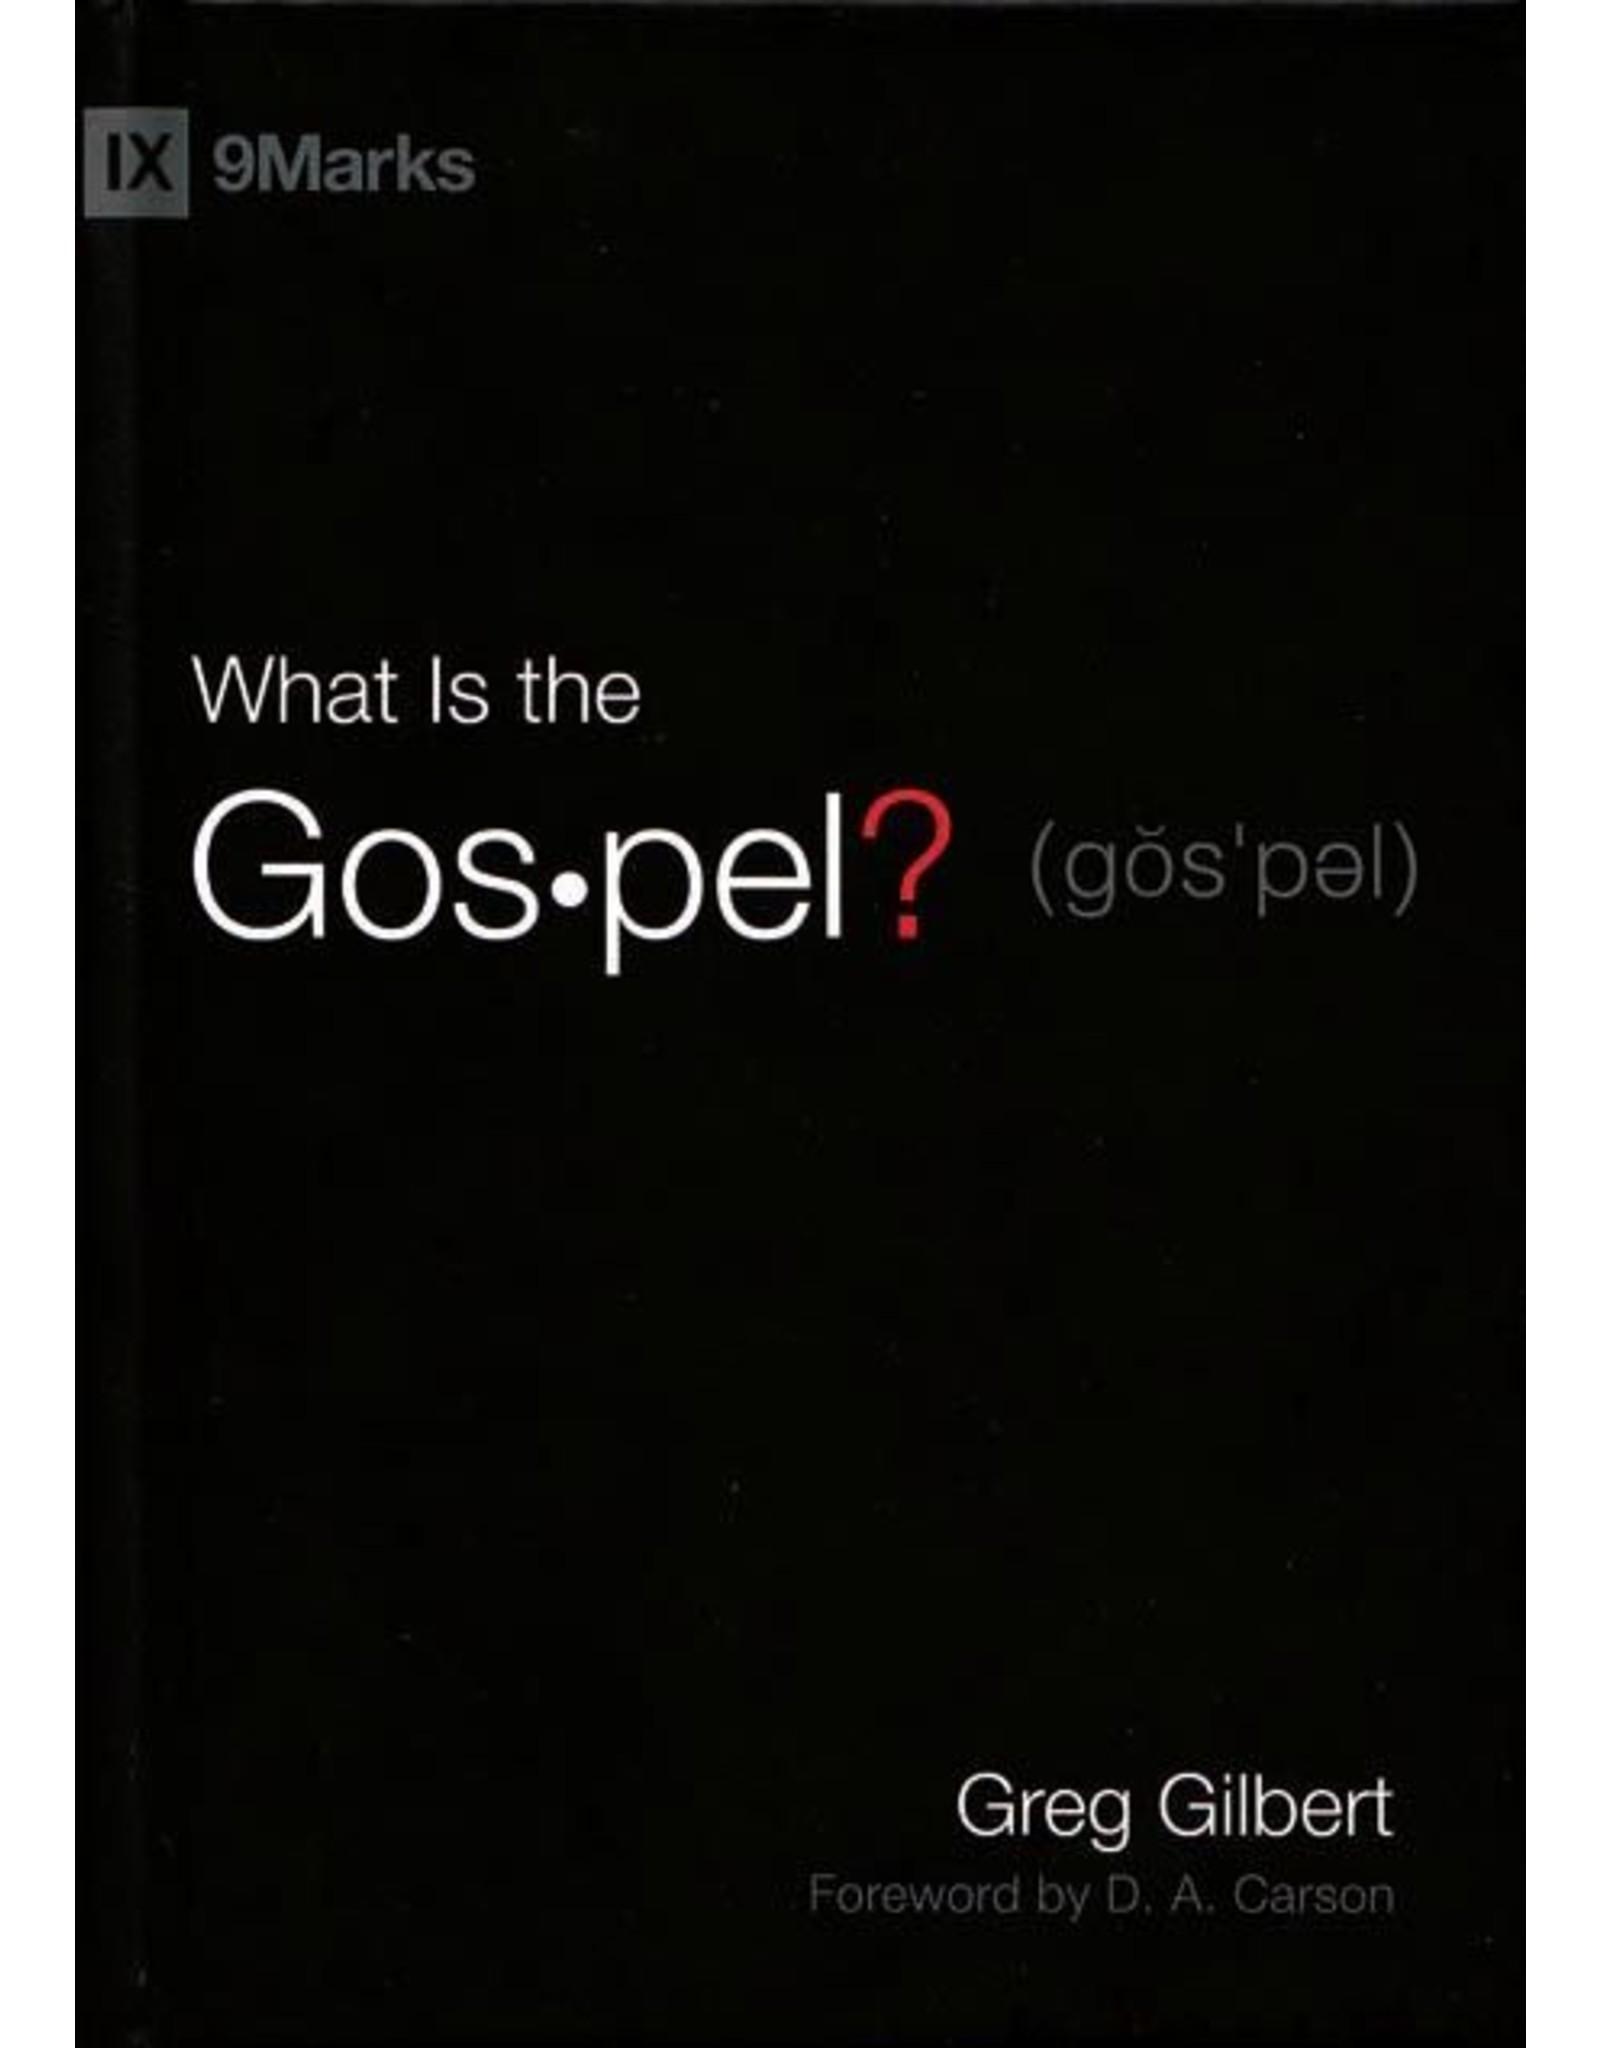 Crossway / Good News What is the Gospel? (book)